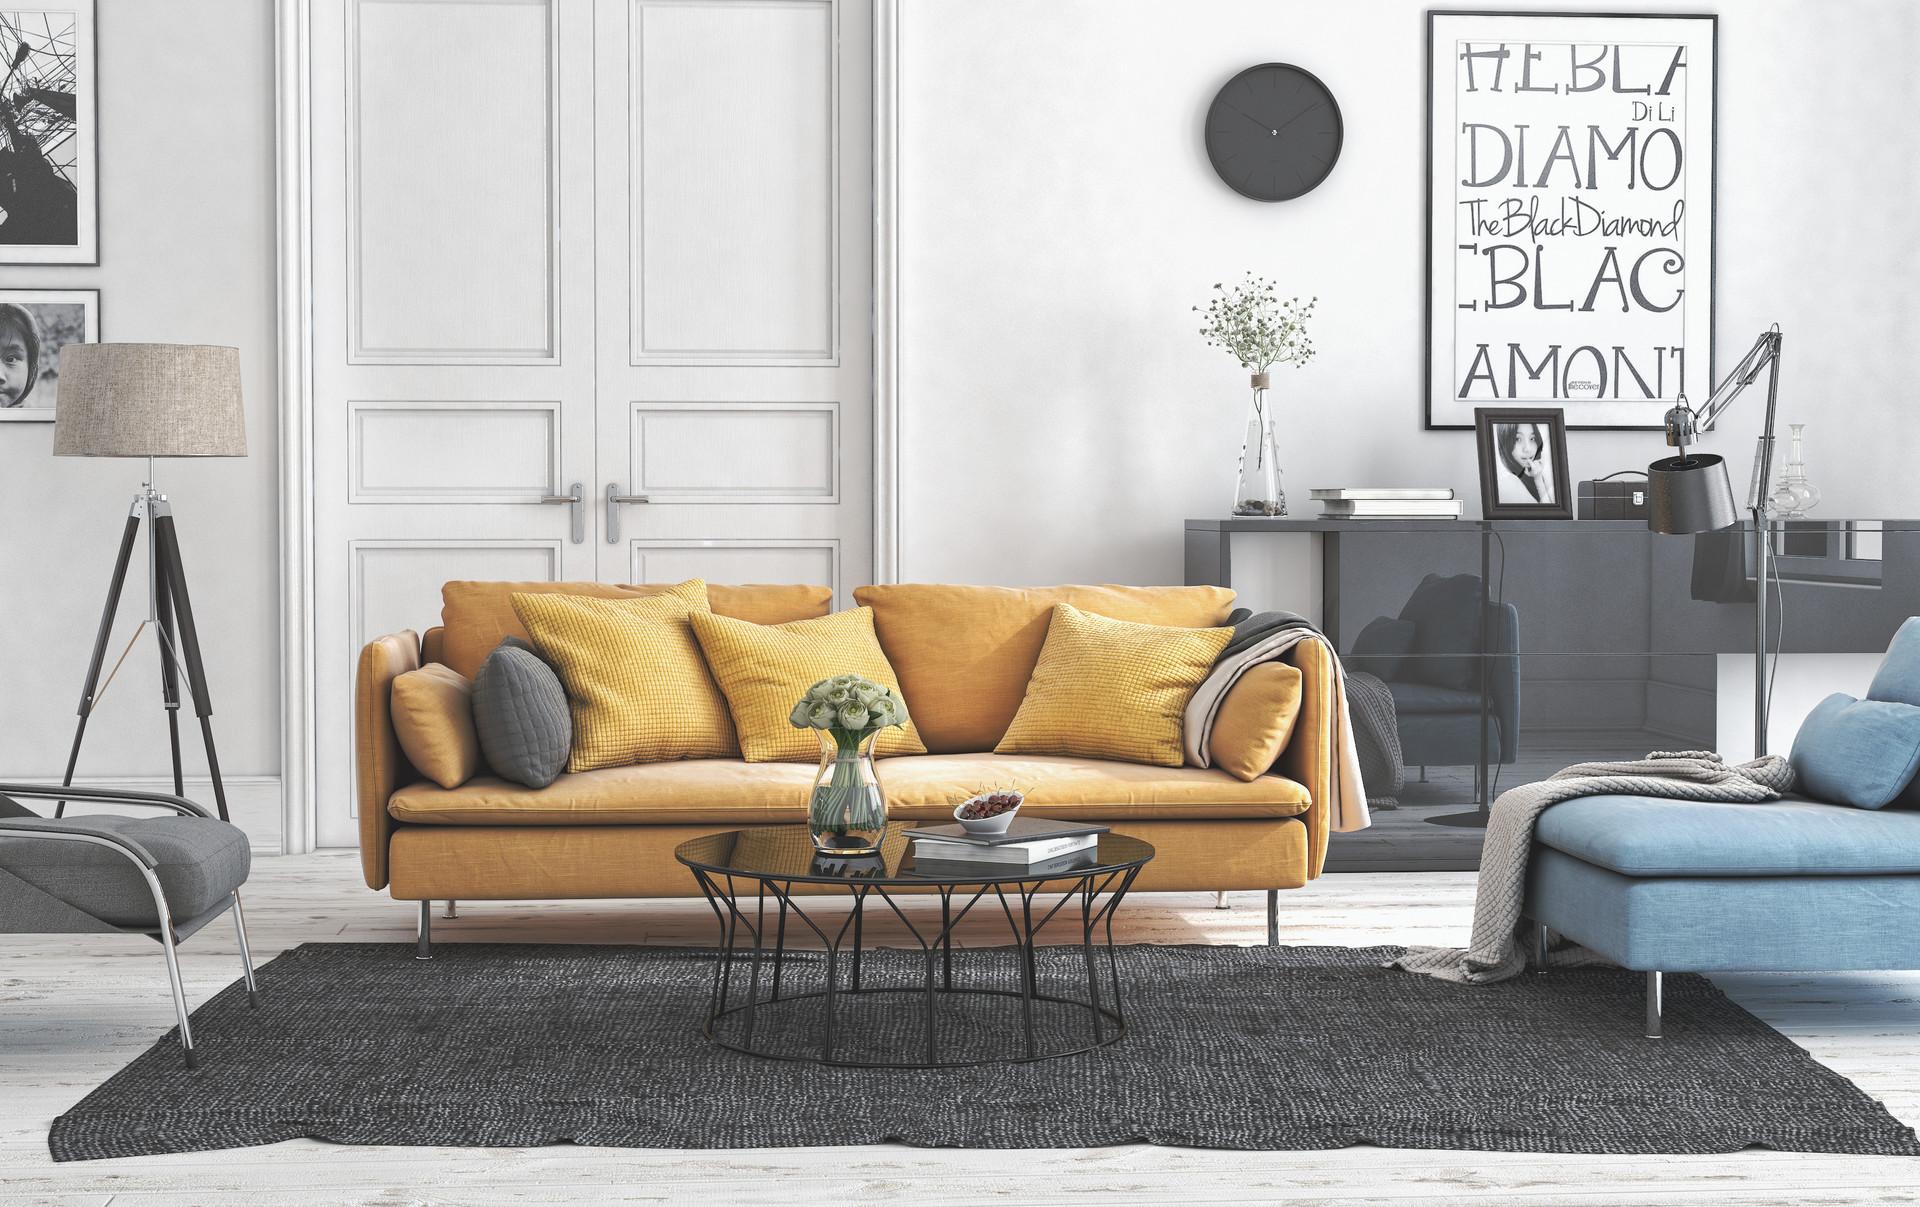 Ikea Living Room Photos 3d okulu - 3d okulu office work : ikea living room yellow sofa